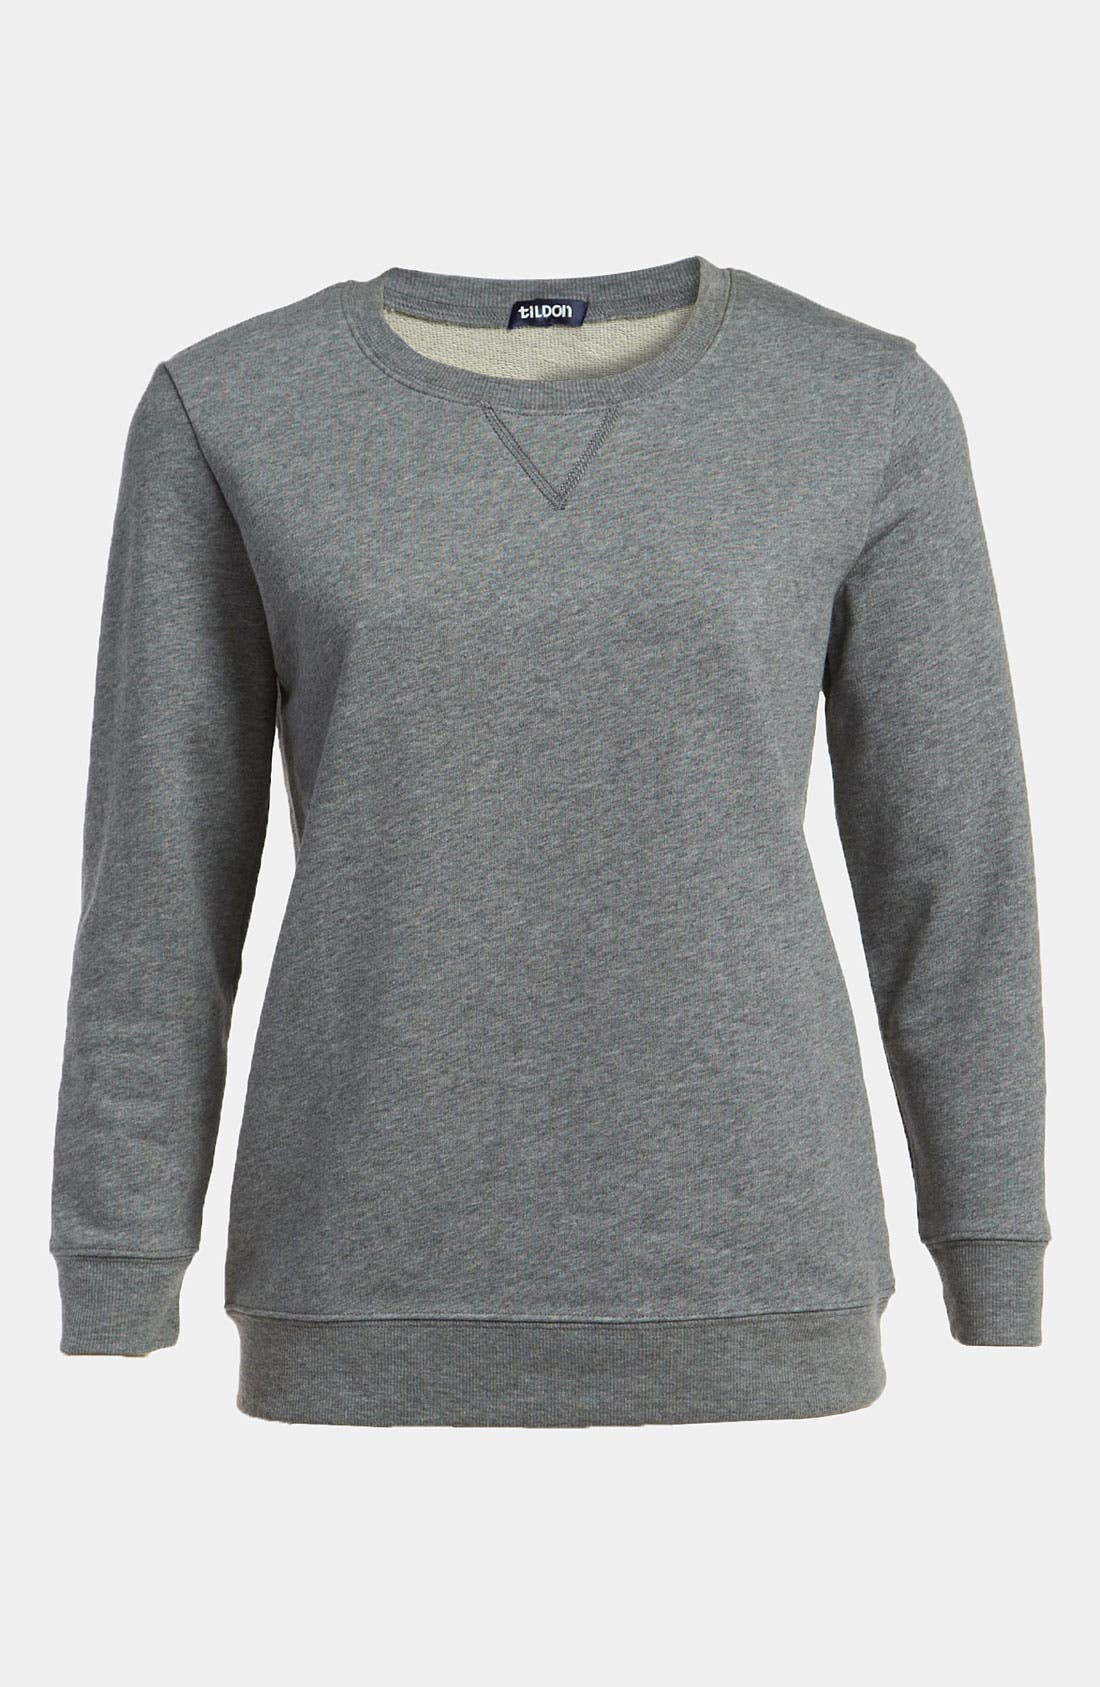 Alternate Image 1 Selected - Tildon Elbow Patch Sweatshirt